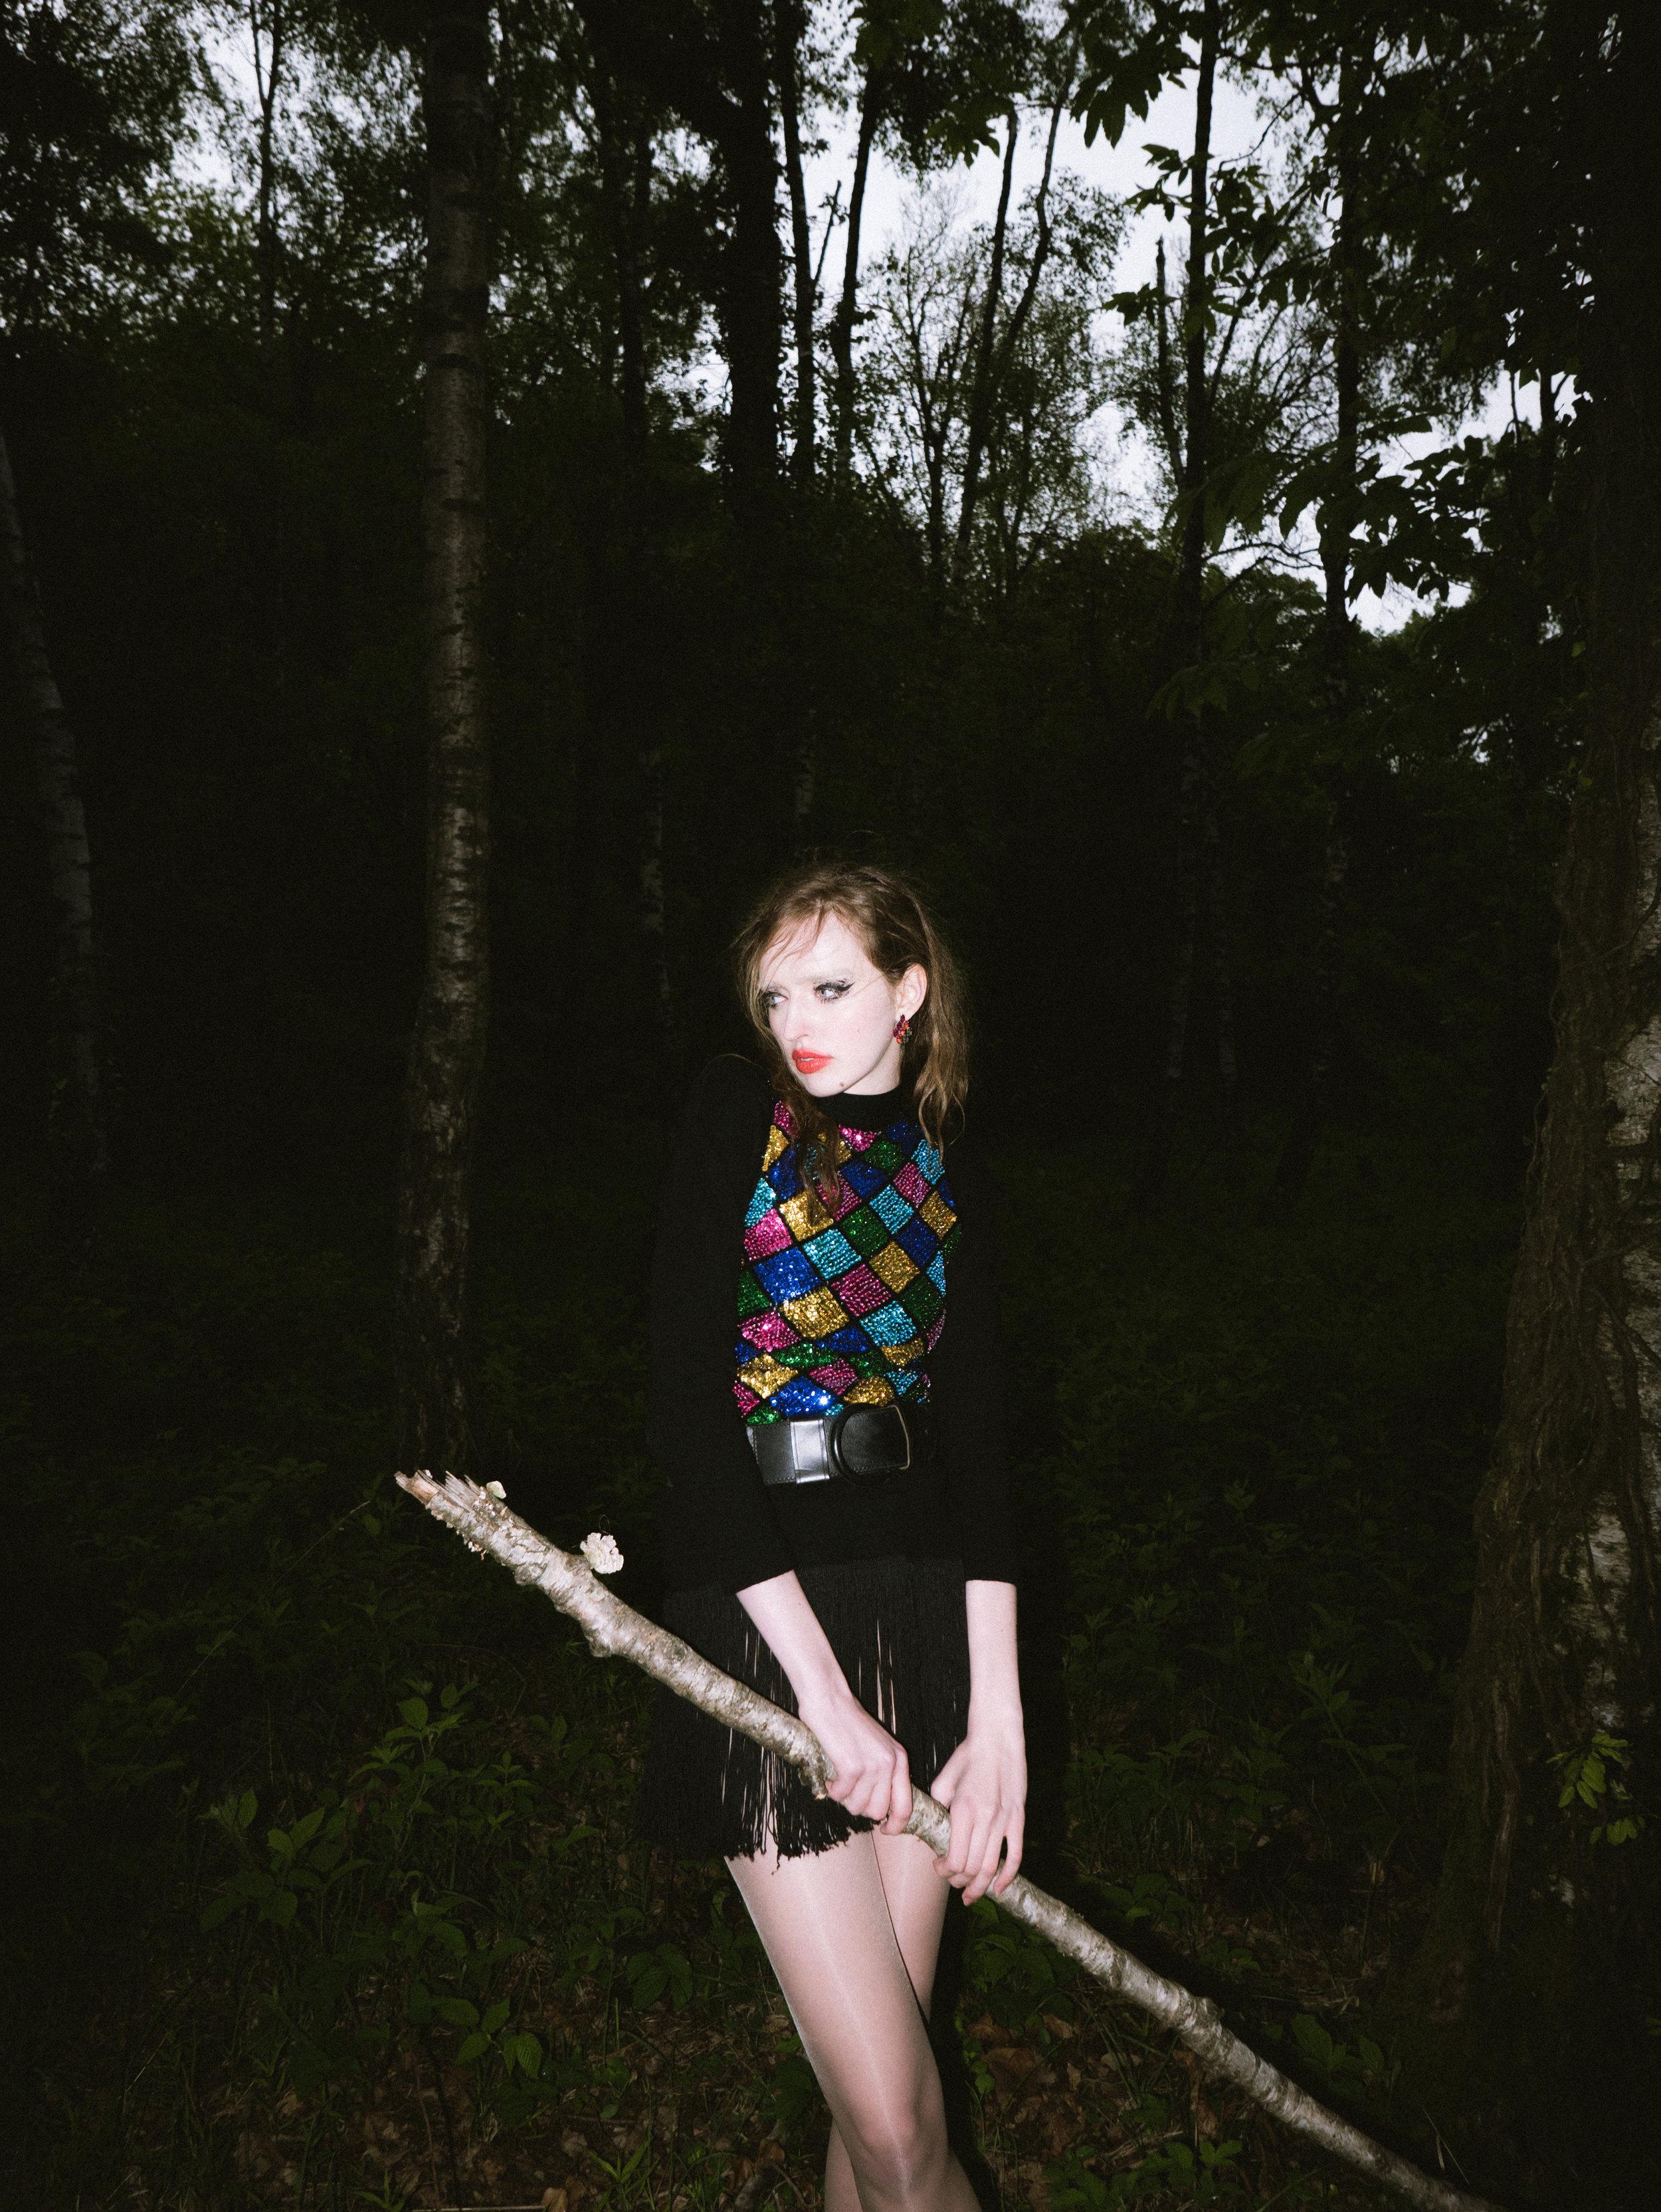 sami oliver nakari_dark woods_06.jpg